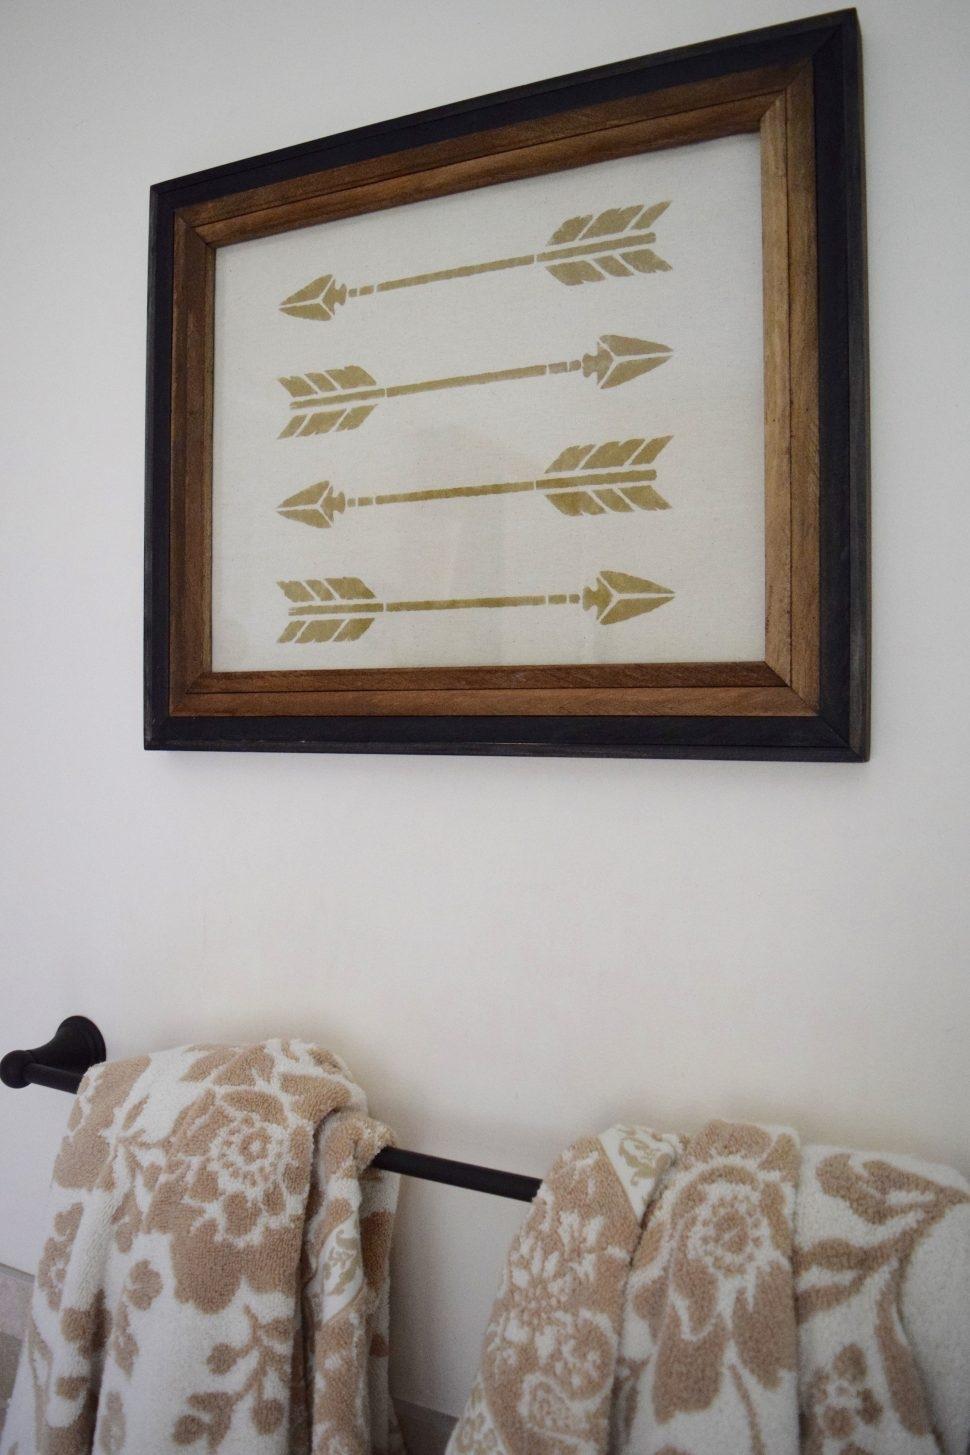 Amazing Marimekko Wall Art Images – The Wall Art Decorations In Most Recent Marimekko Fabric Wall Art (View 1 of 15)